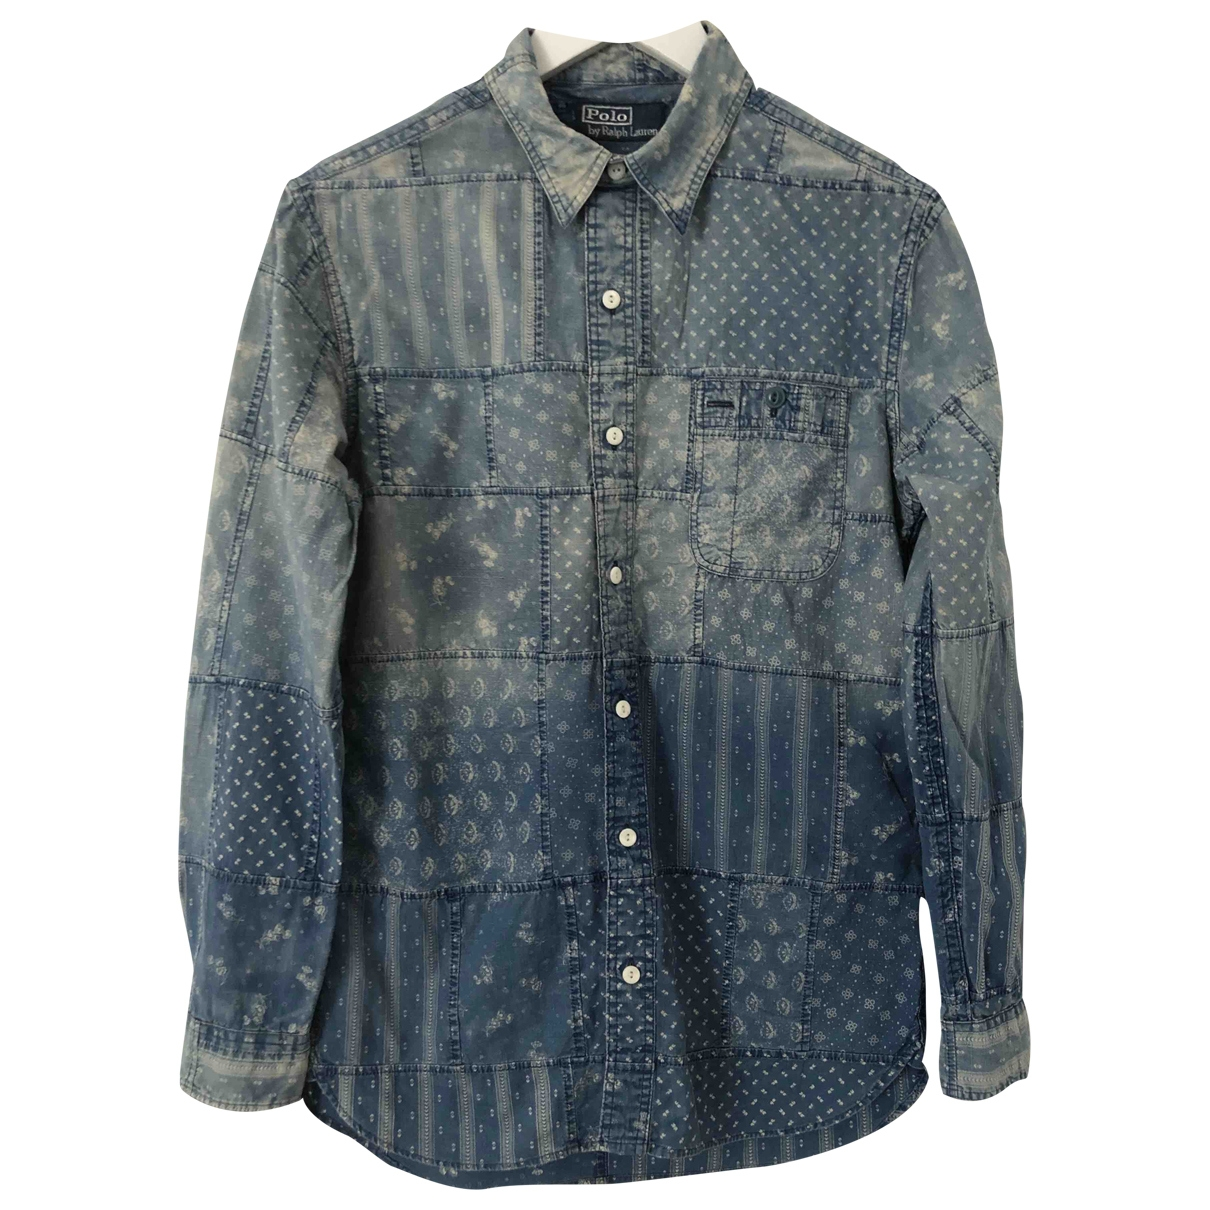 Polo Ralph Lauren \N Hemden in  Blau Denim - Jeans